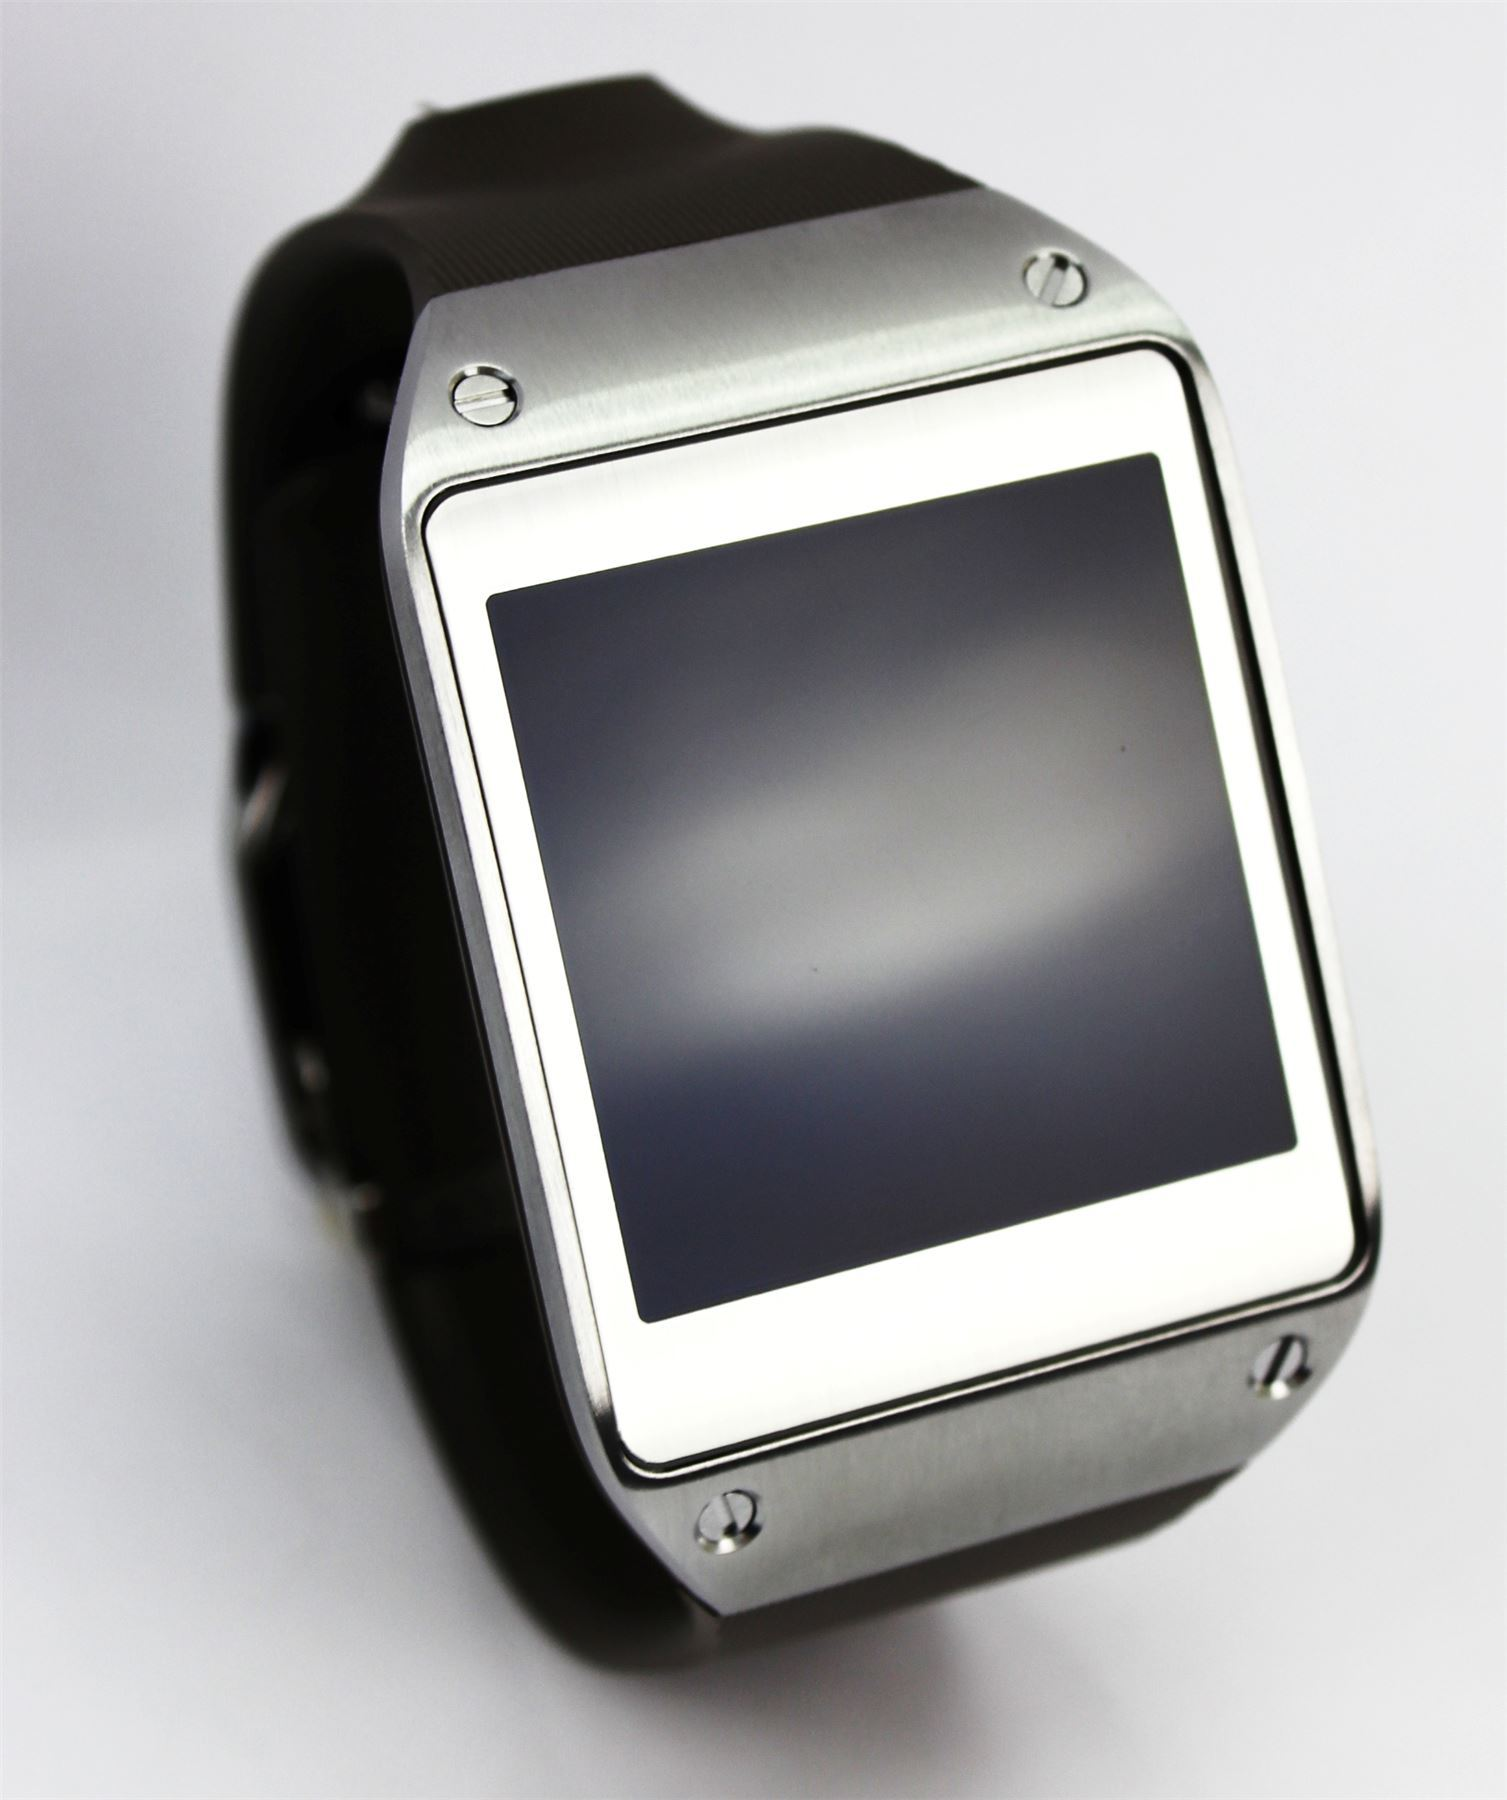 Samsung Galaxy Gear SM-V700 Camera Fitness AMOLED Android ...  Samsung Galaxy ...